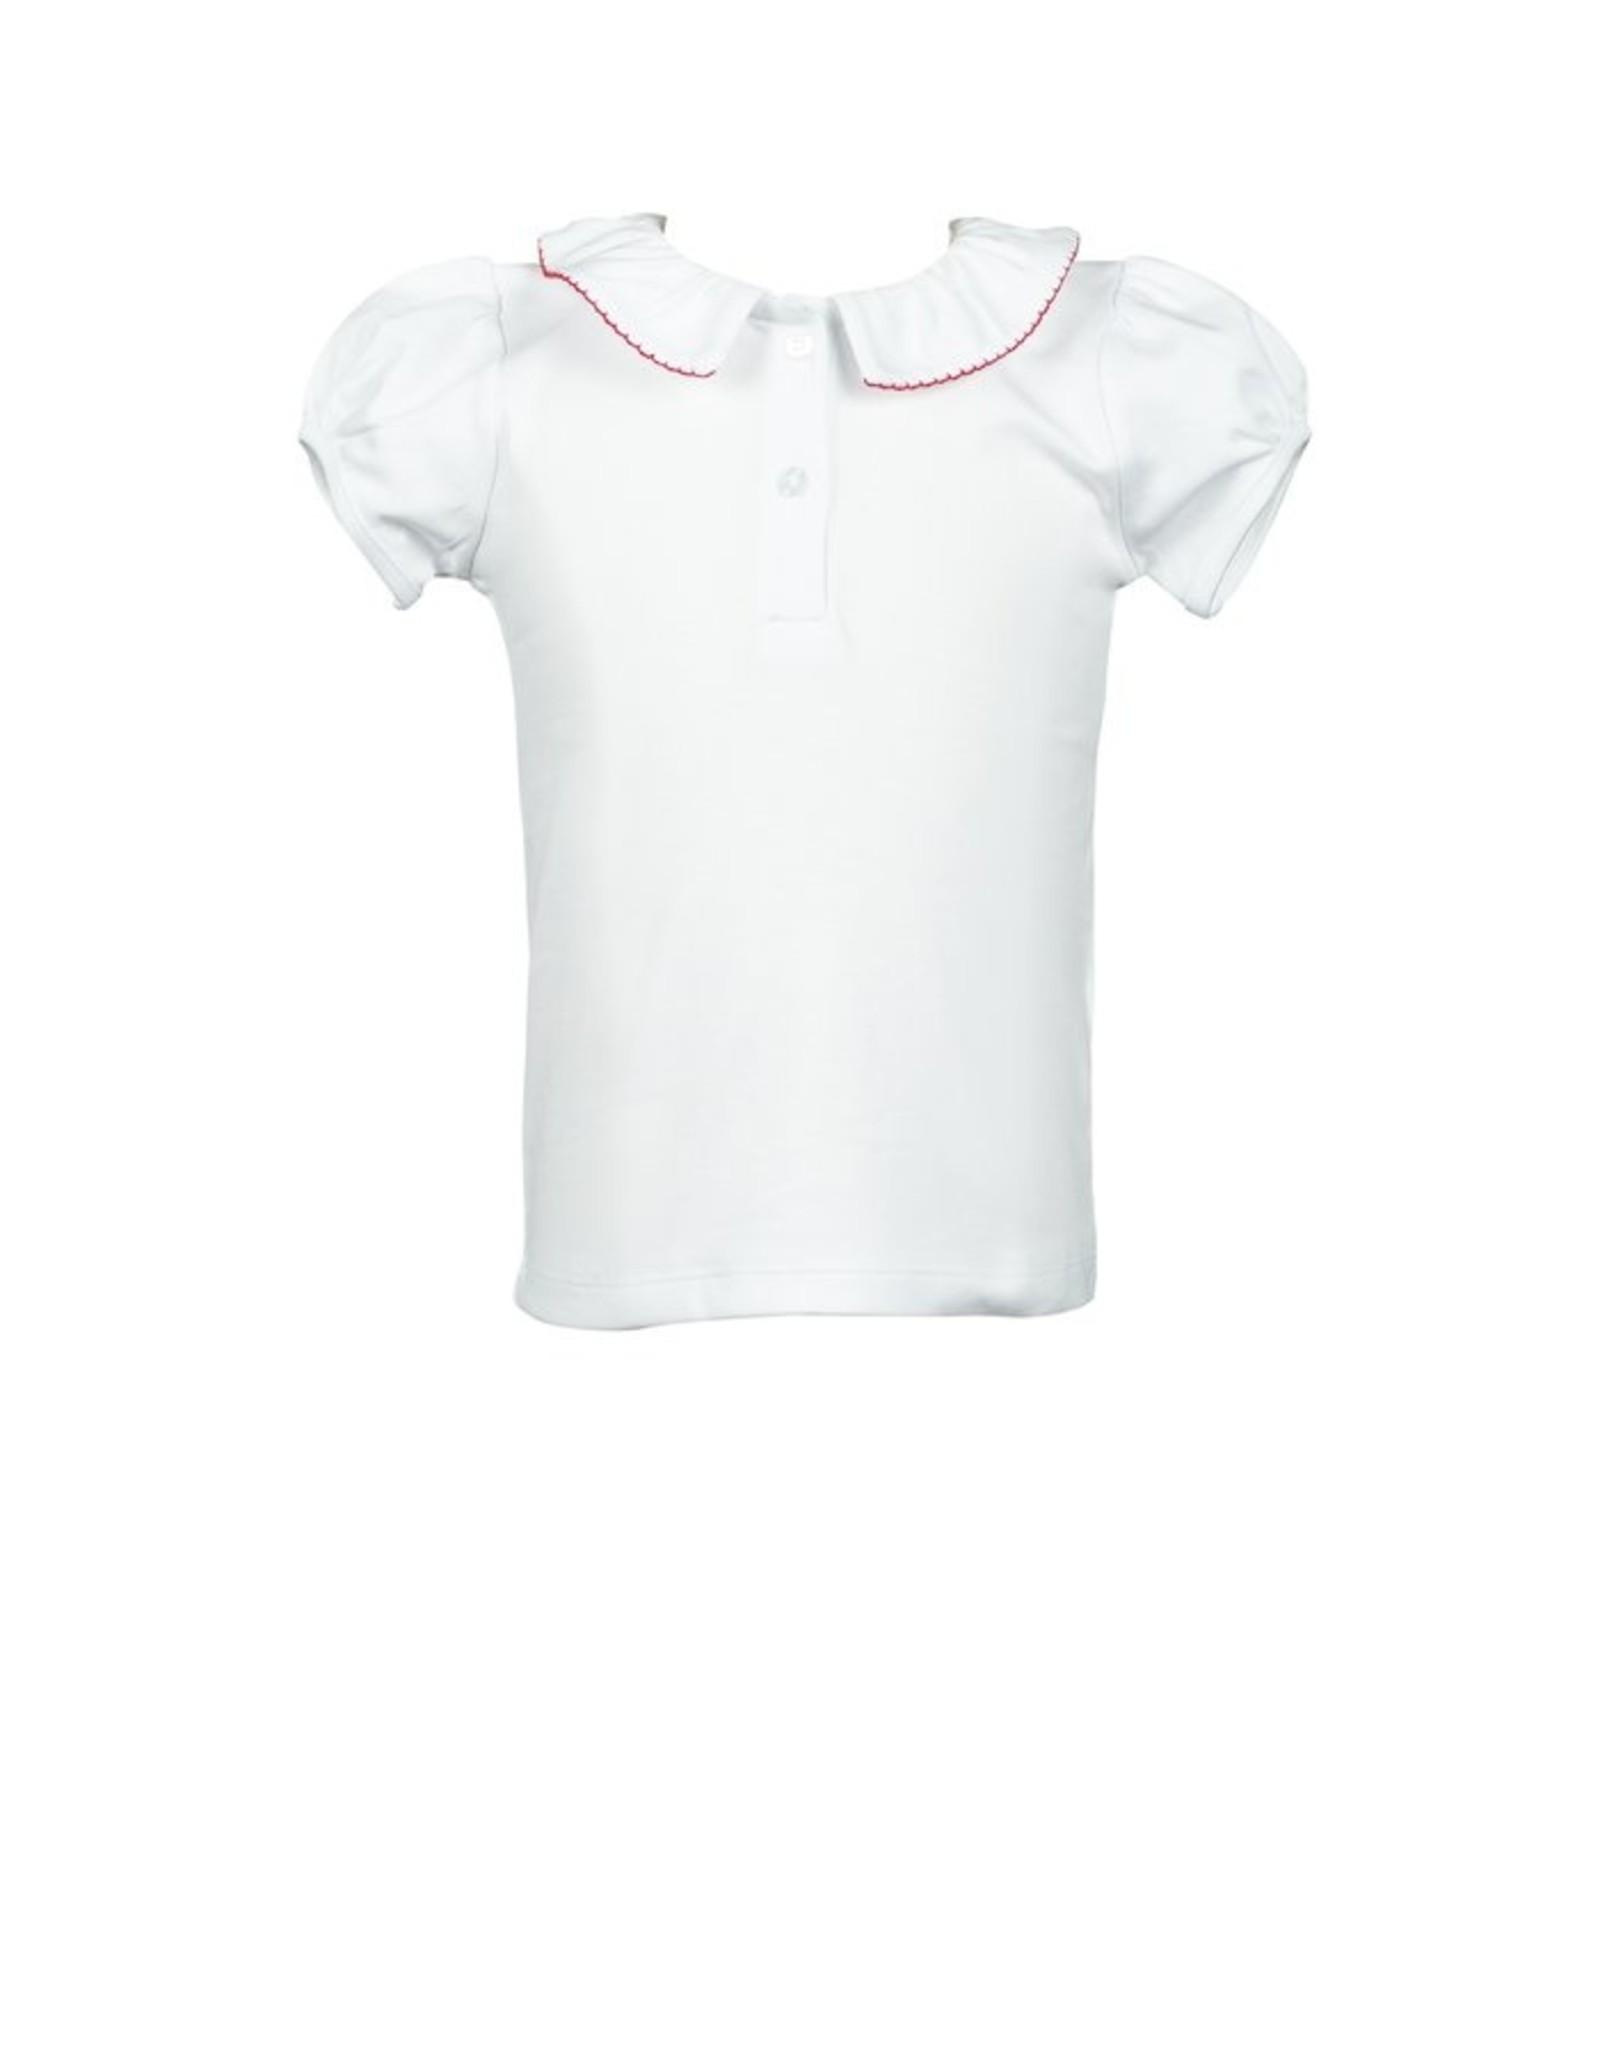 The Proper Peony Apple Plaid Pima Shirt White/Red Trim